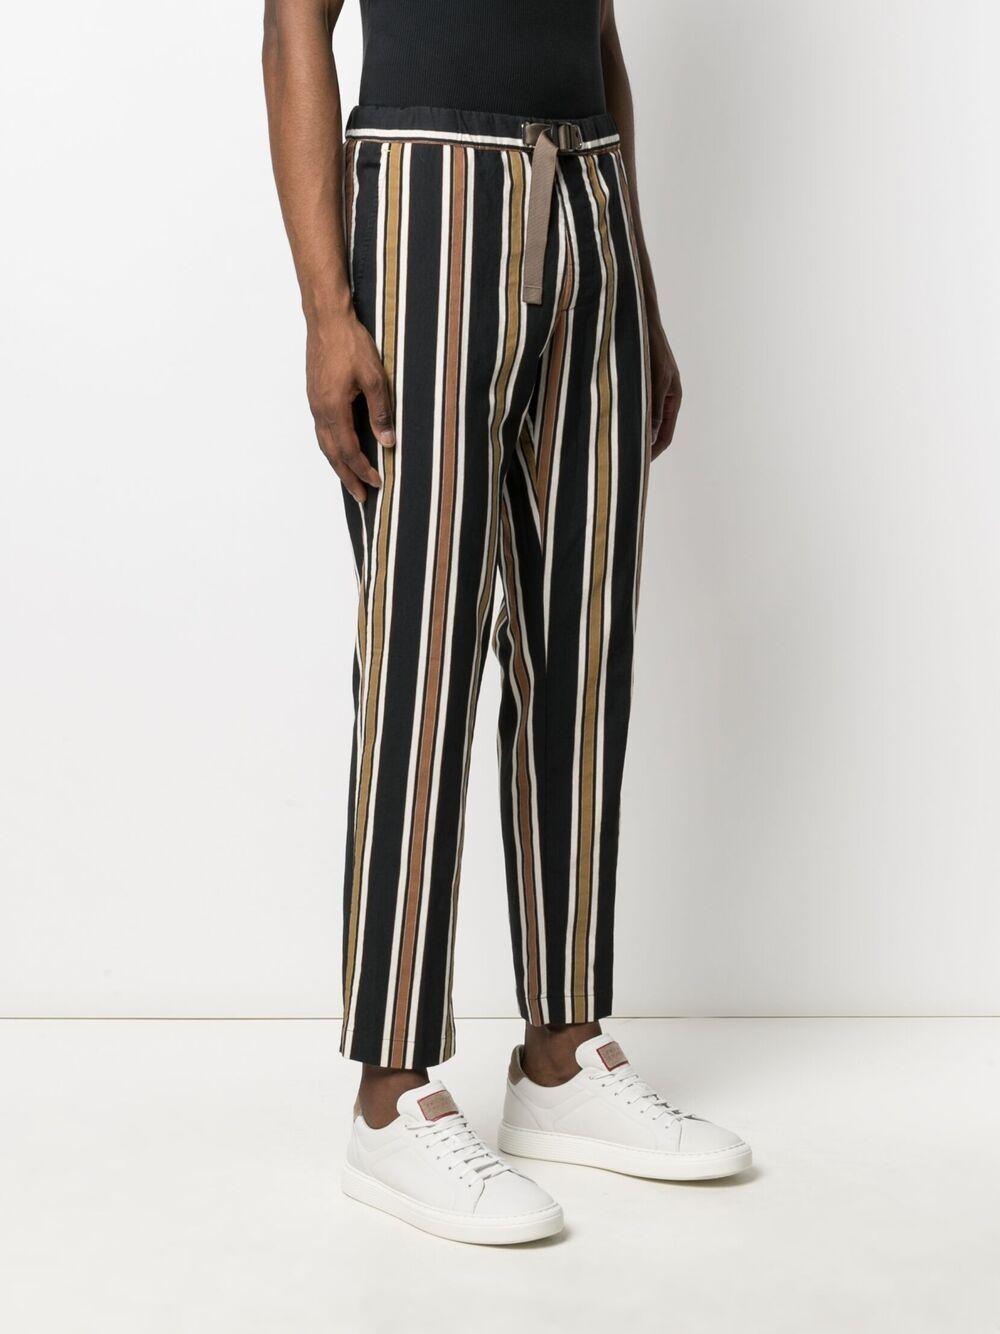 Pantaloni neri, bianchi e beige in misto cotone e lino MANUEL RITZ | Pantaloni | 3032P1618L-21302088